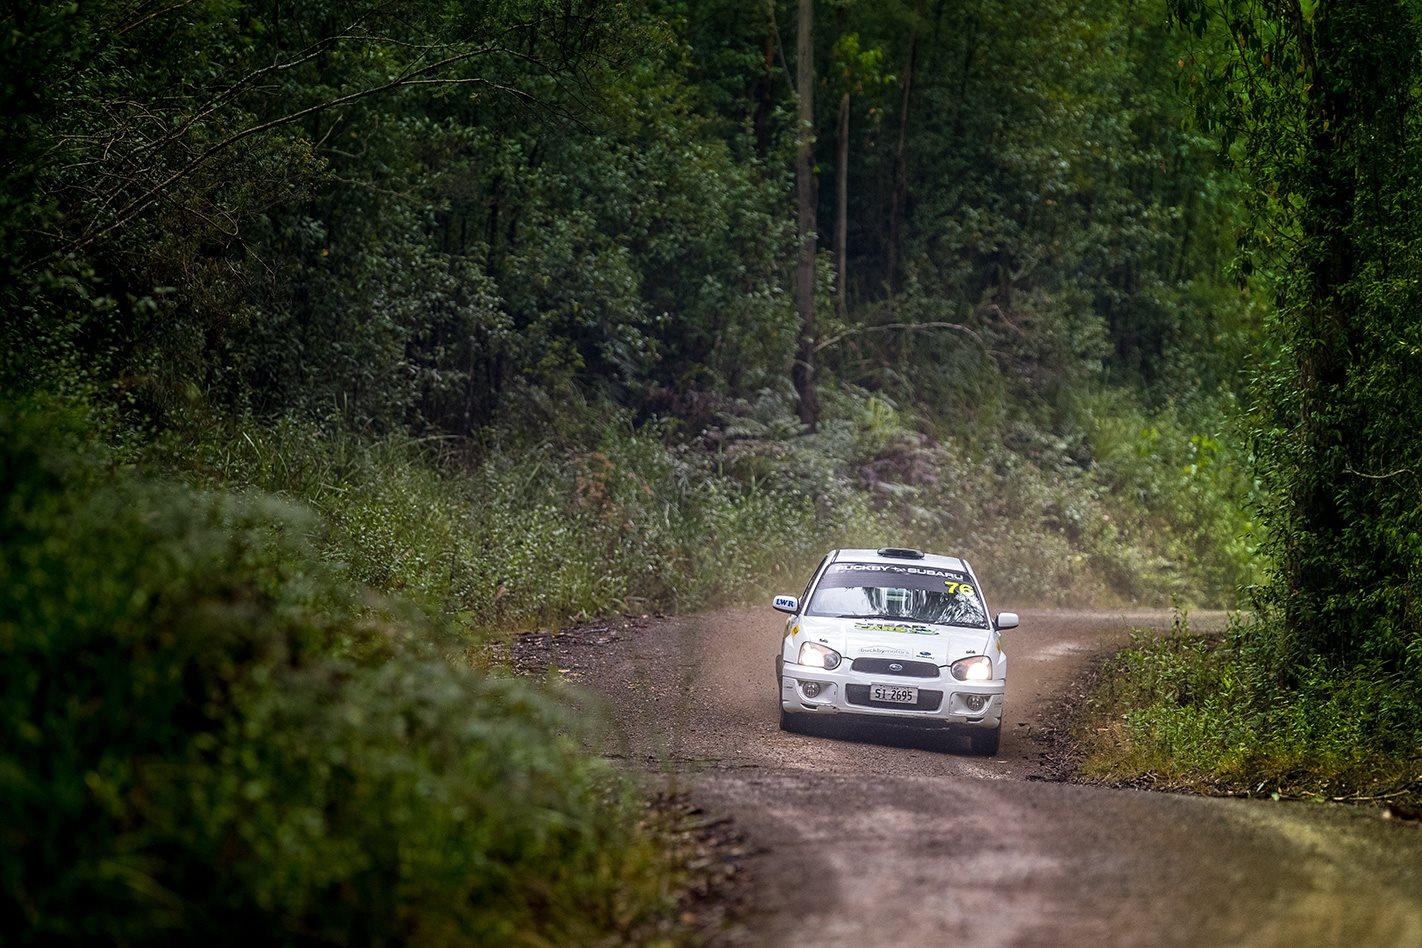 Subaru Impreza RS scenery